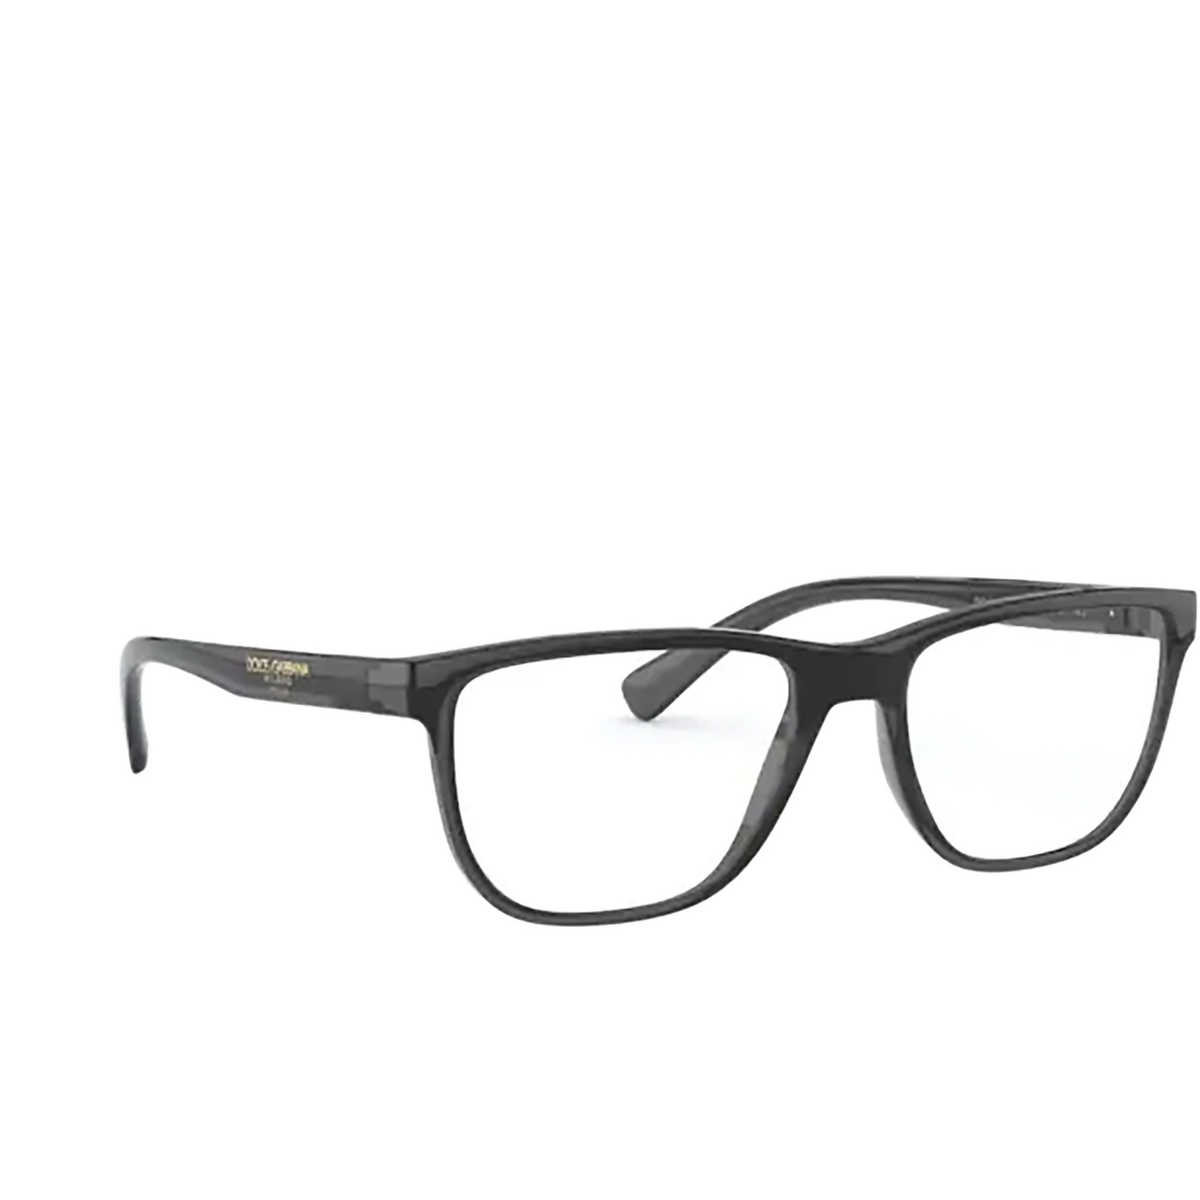 Dolce & Gabbana® Rectangle Eyeglasses: DG5053 color Transparent Grey / Black 3257 - three-quarters view.